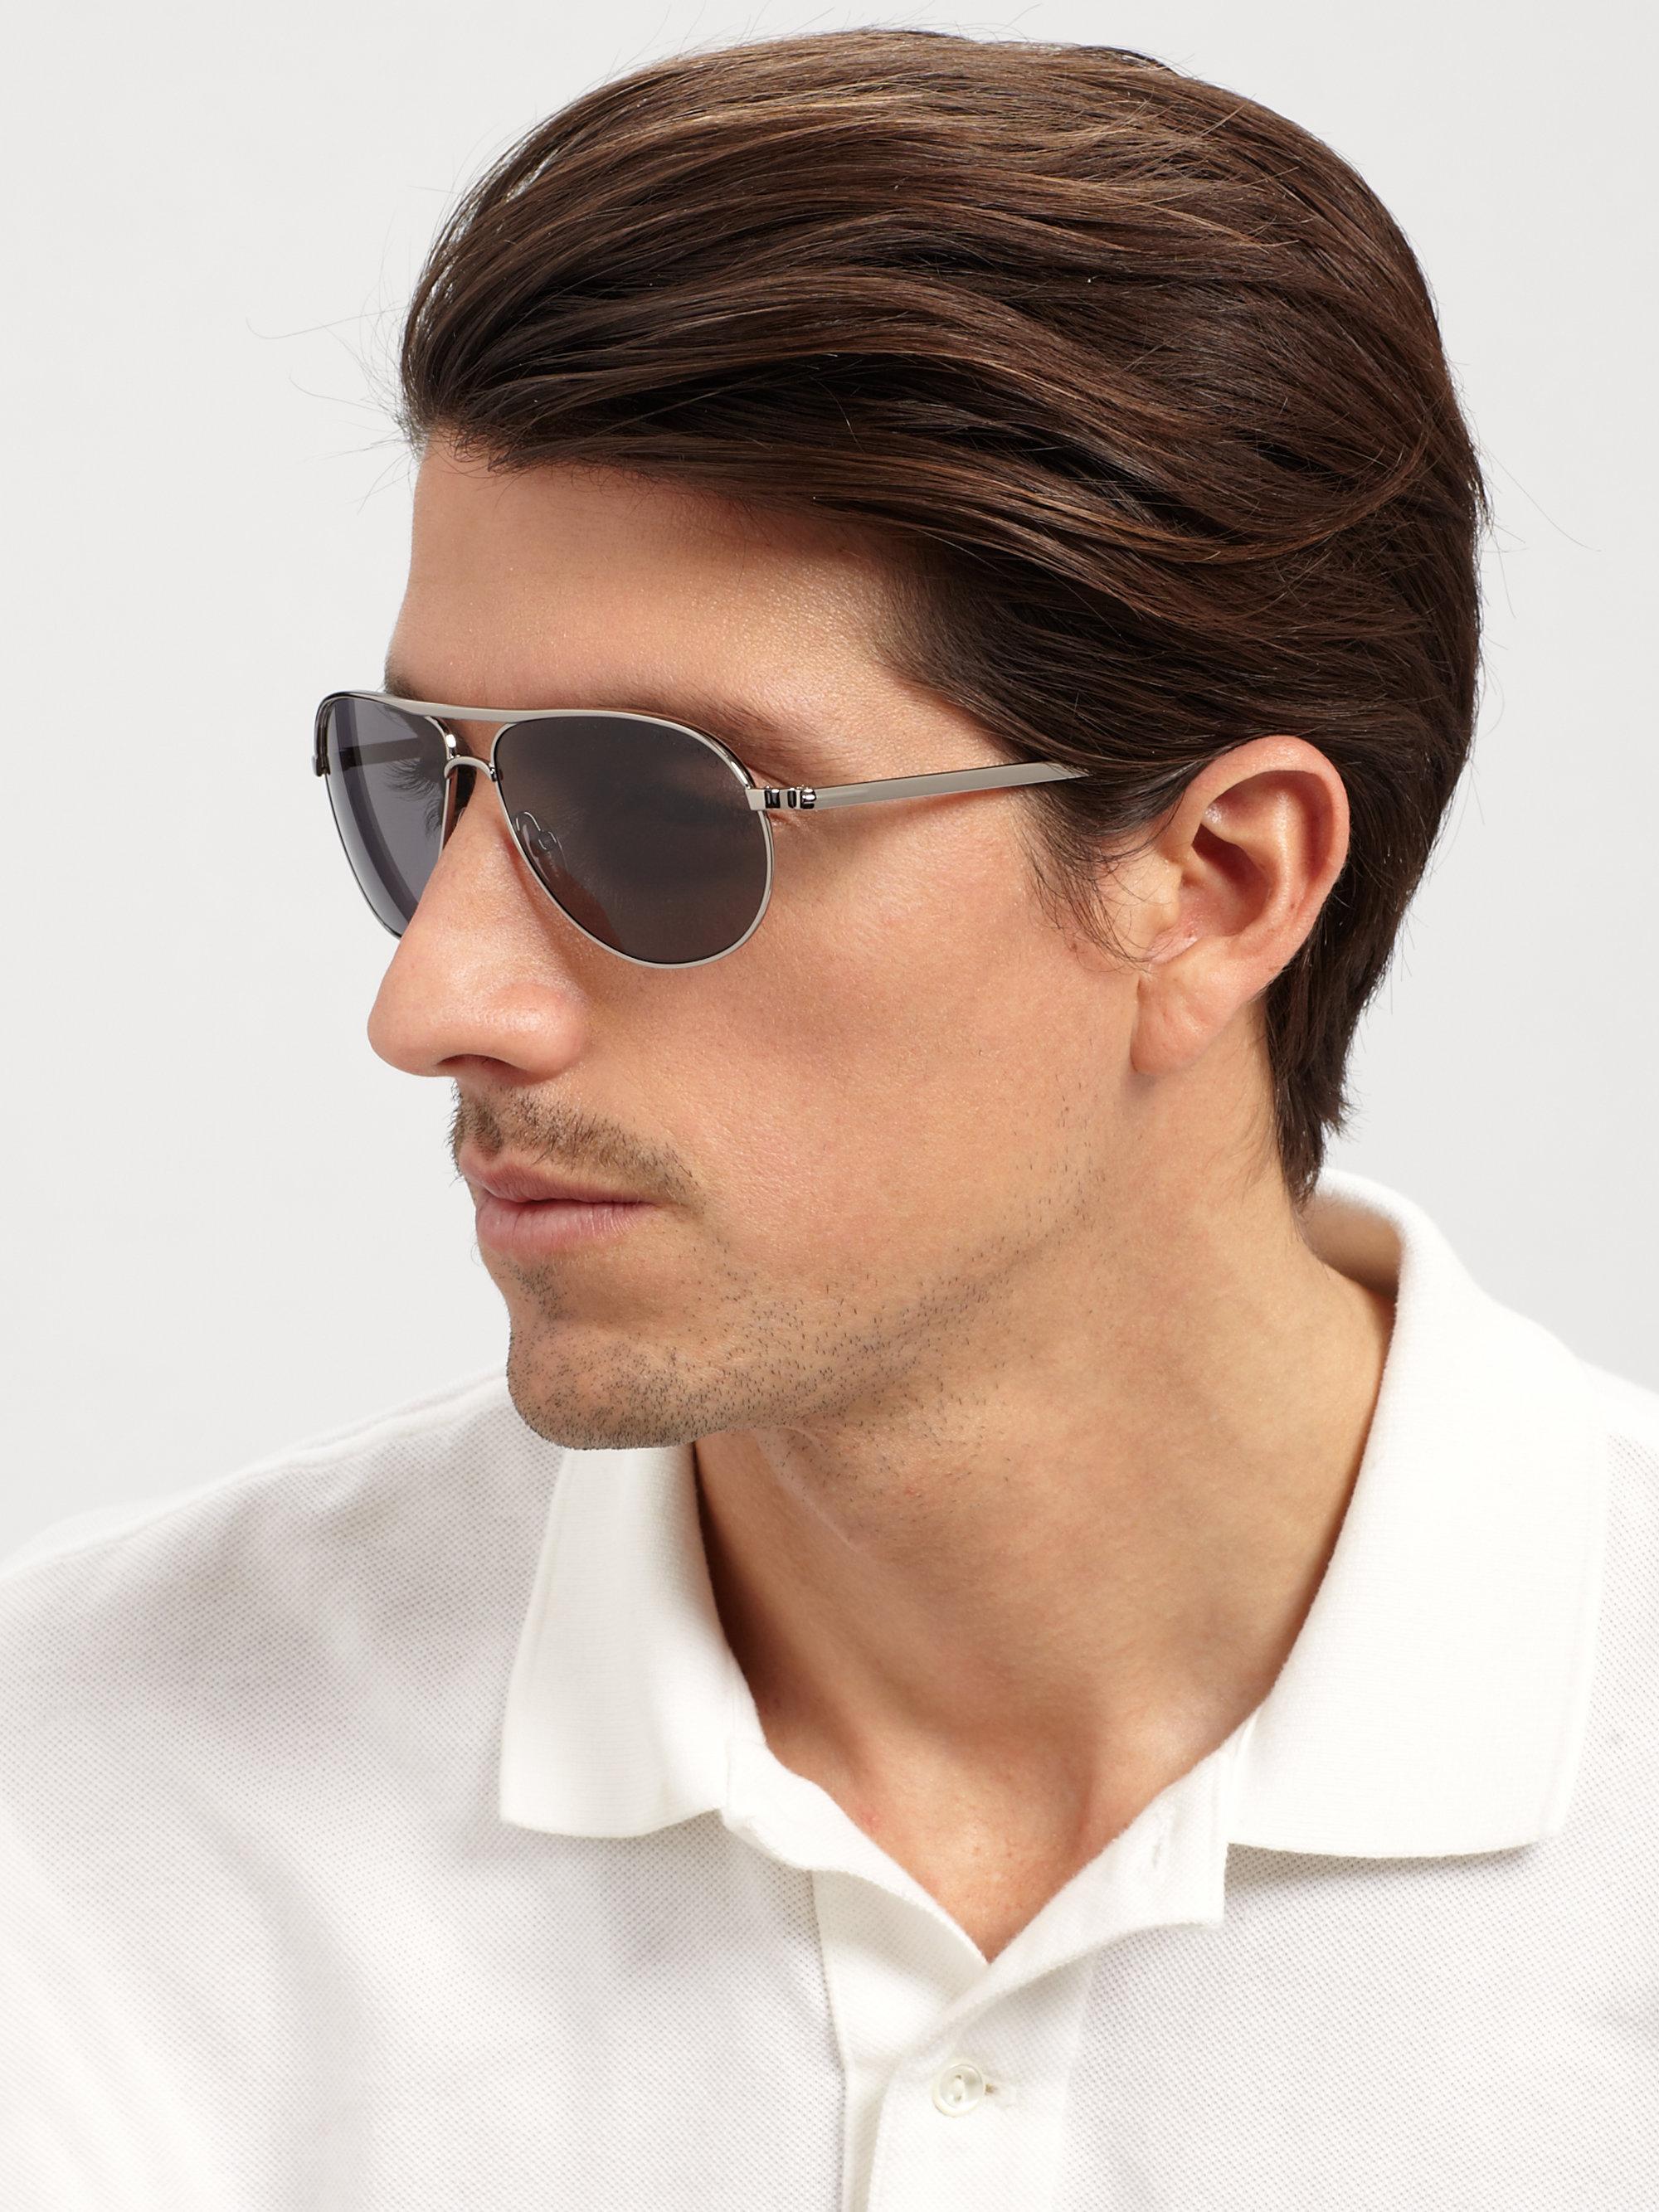 b556a8edc9 Lyst - Tom Ford Marko Metal Aviator Sunglasses in Gray for Men